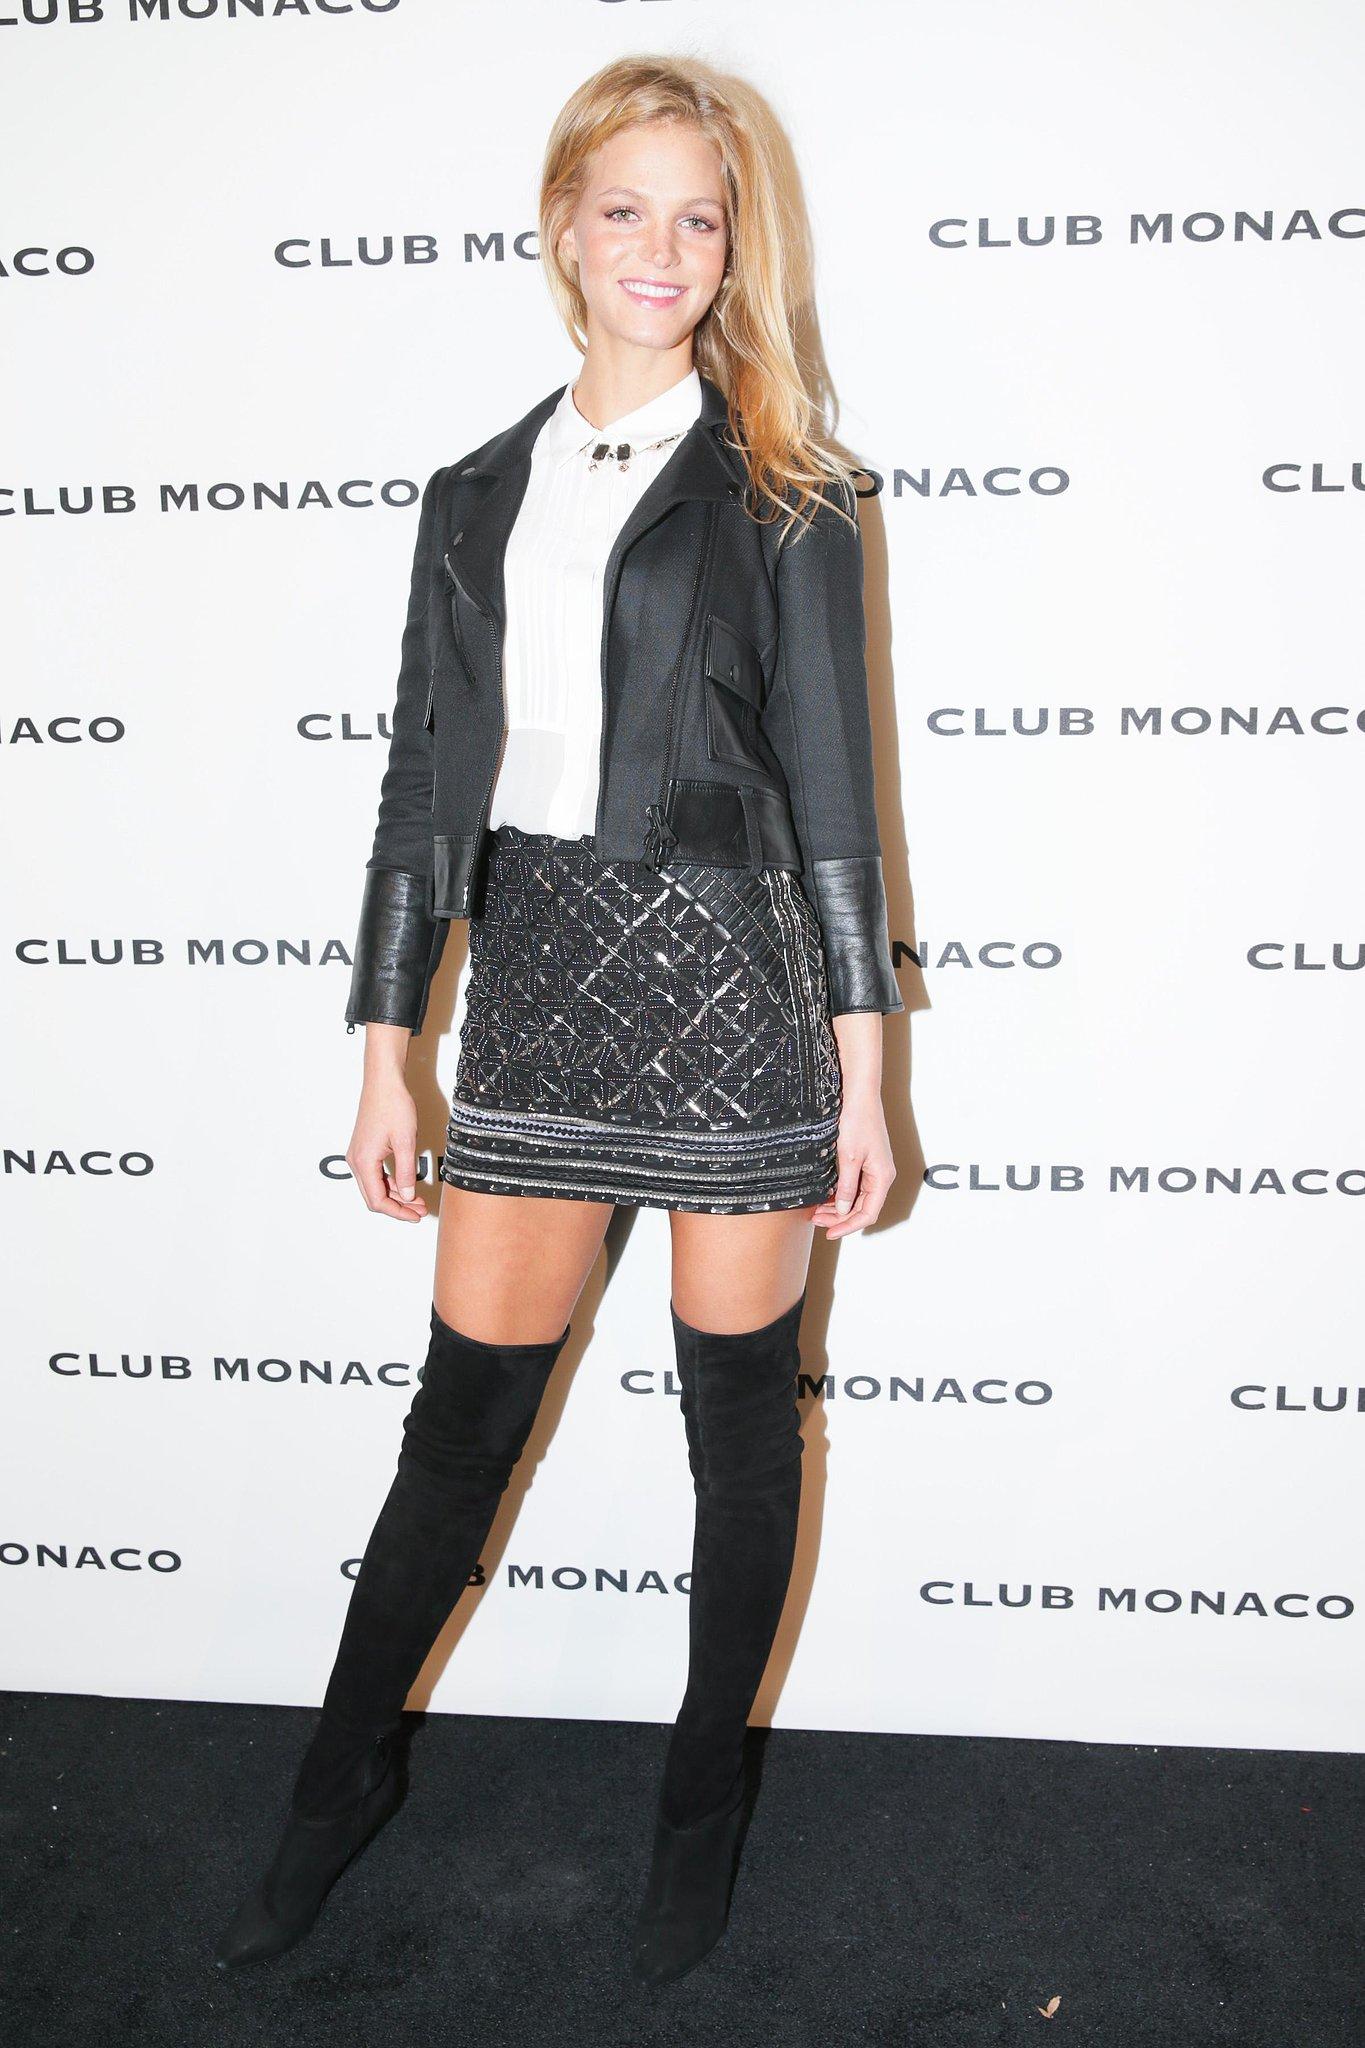 Erin Heatherton helped reopen the Fifth Avenue Club Monaco in a sparkling mini.